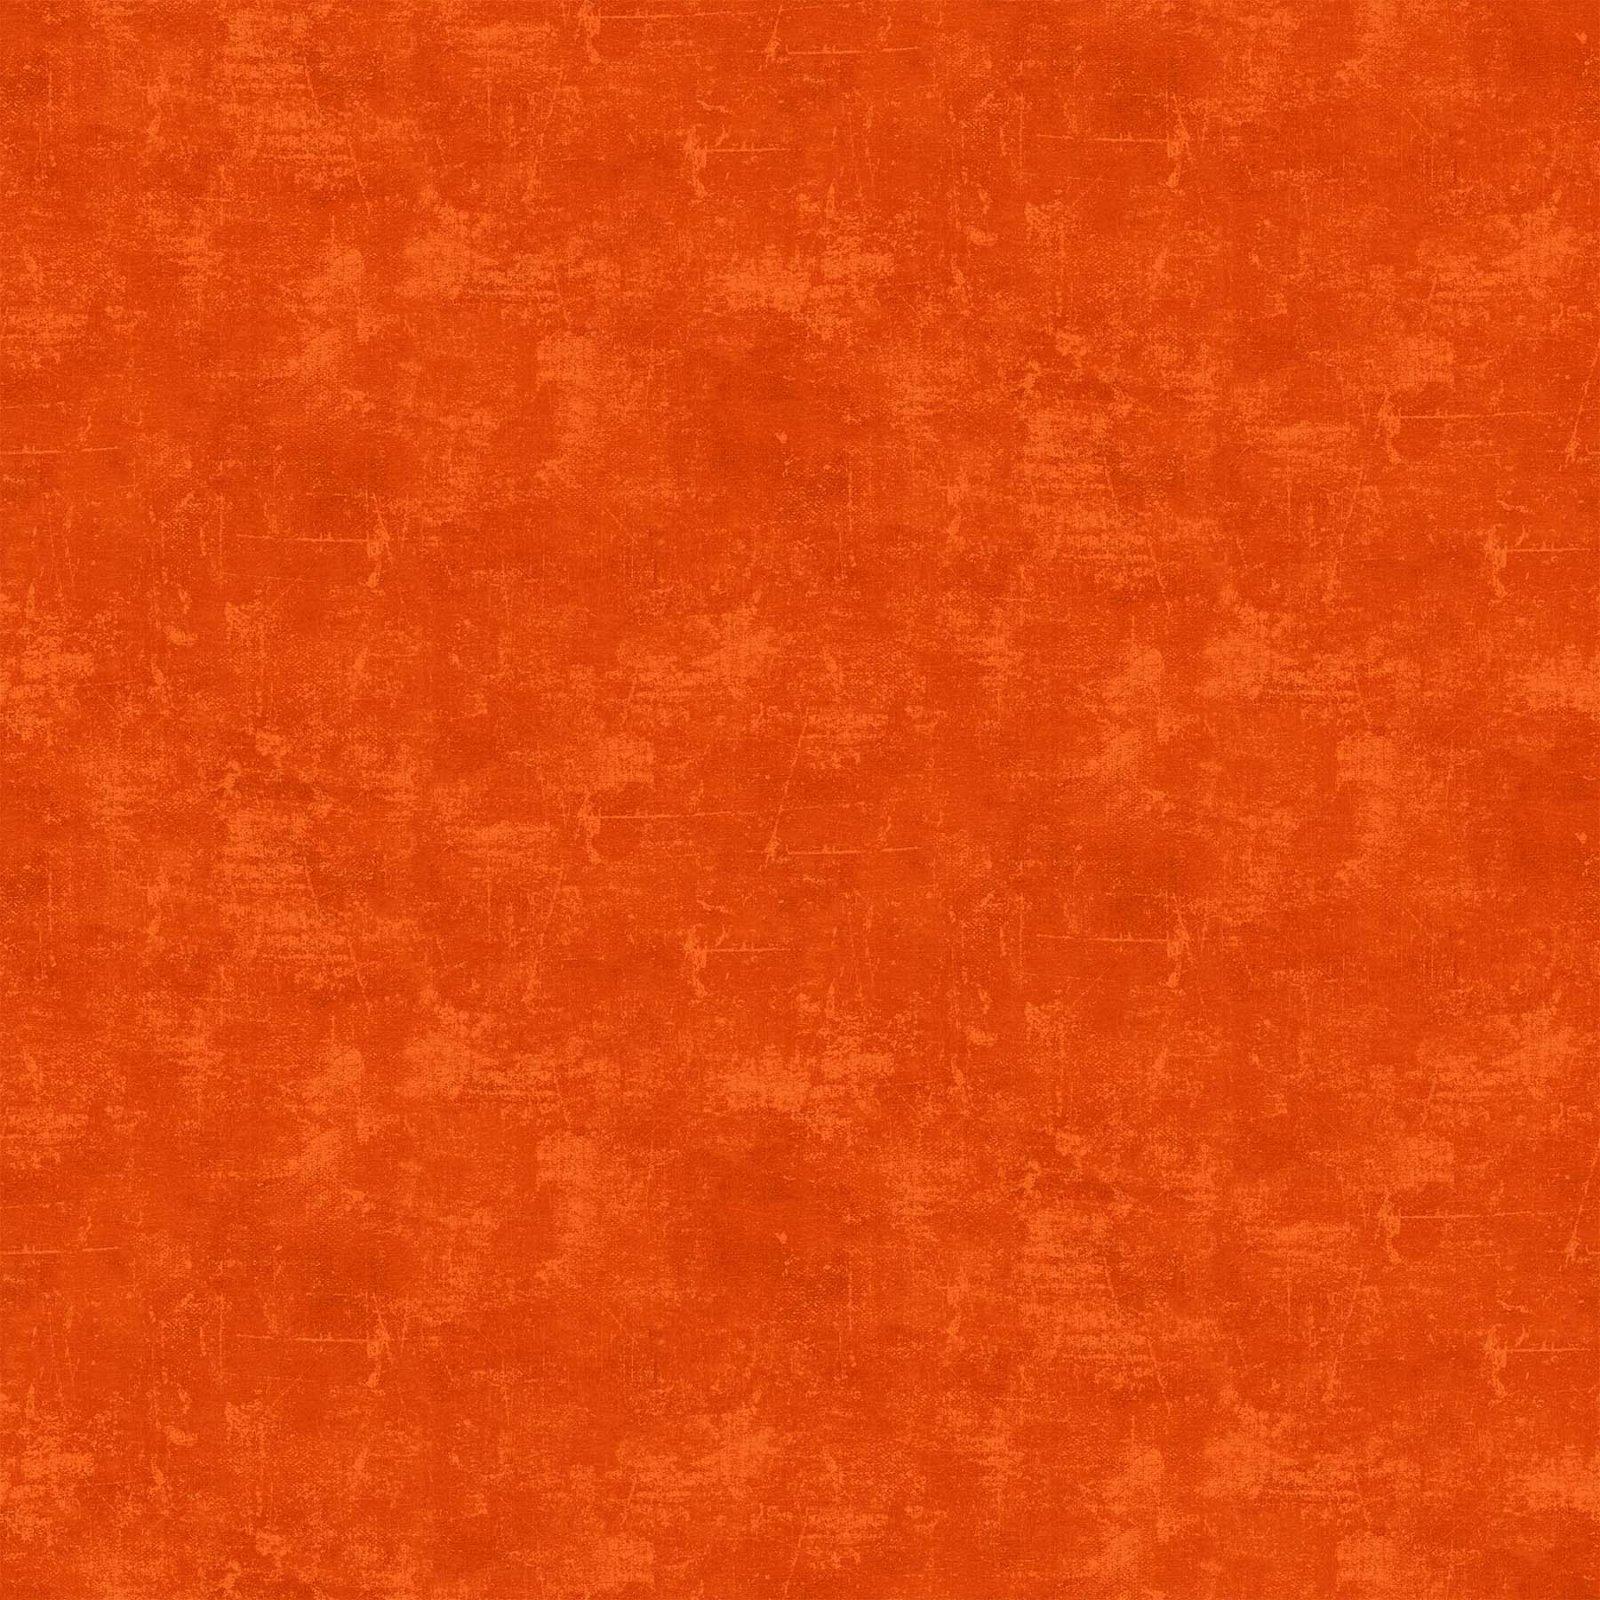 Canvas Orange Peel